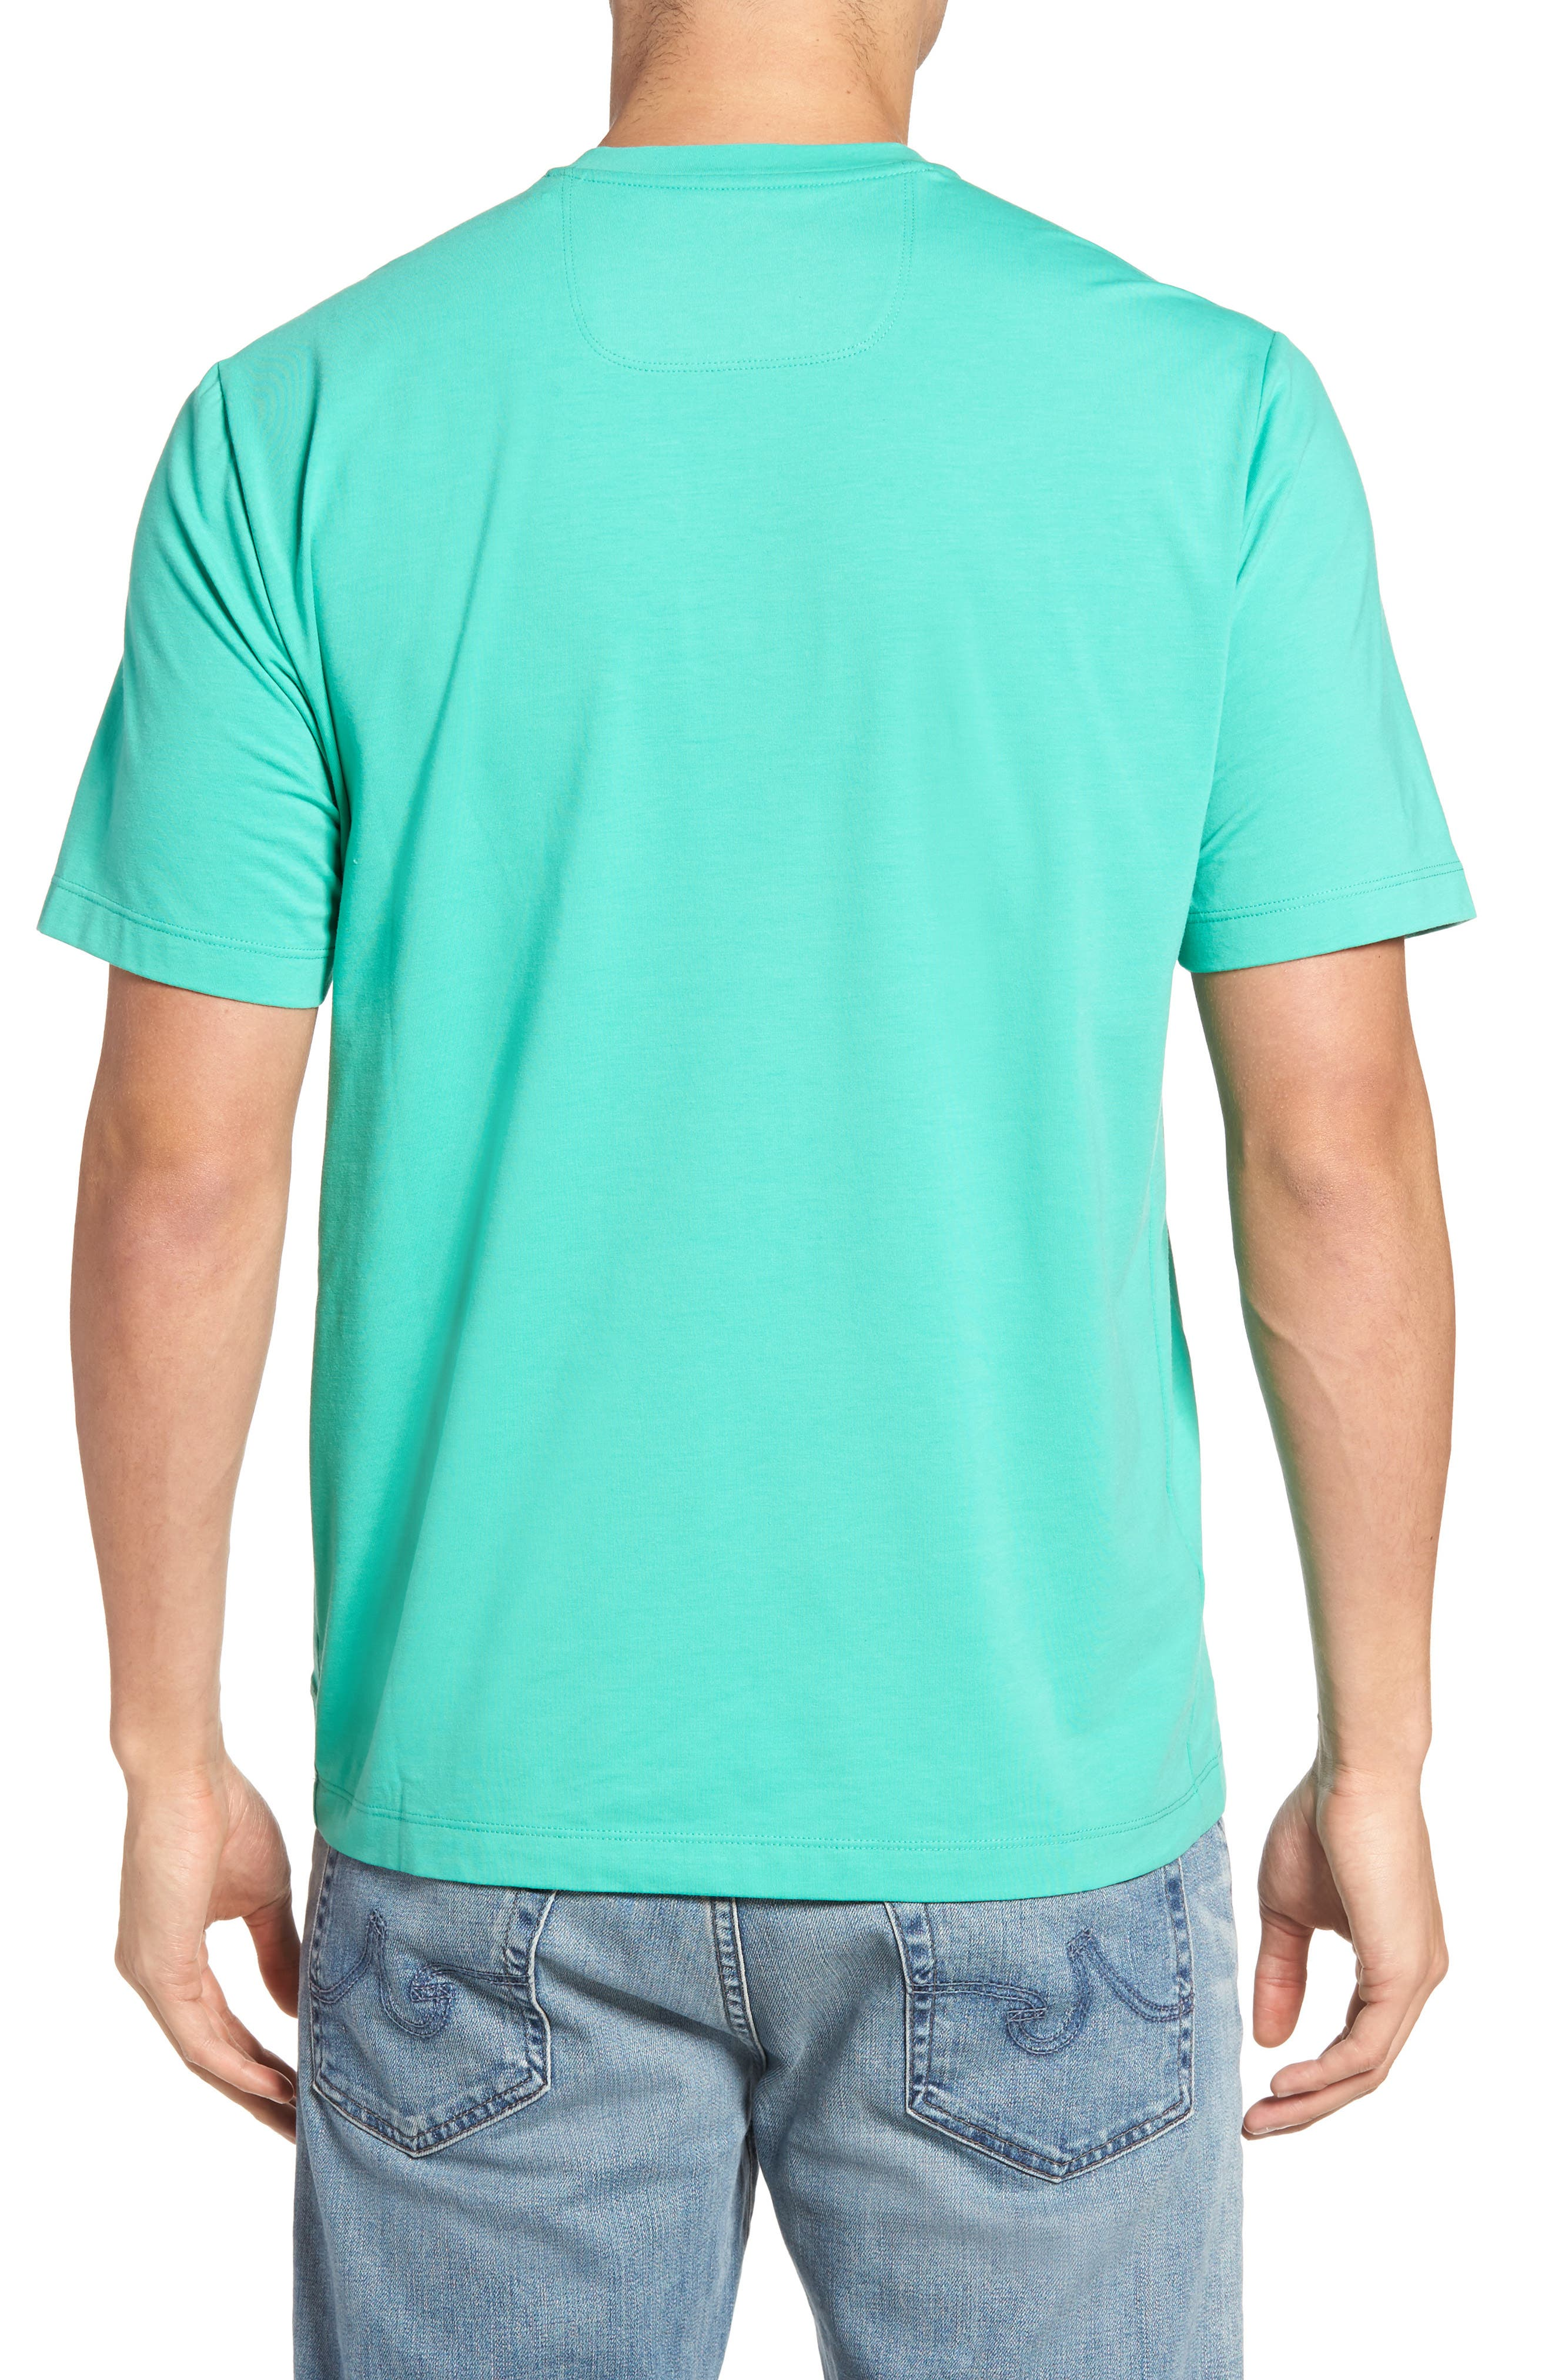 Tropicool T-Shirt,                             Alternate thumbnail 17, color,